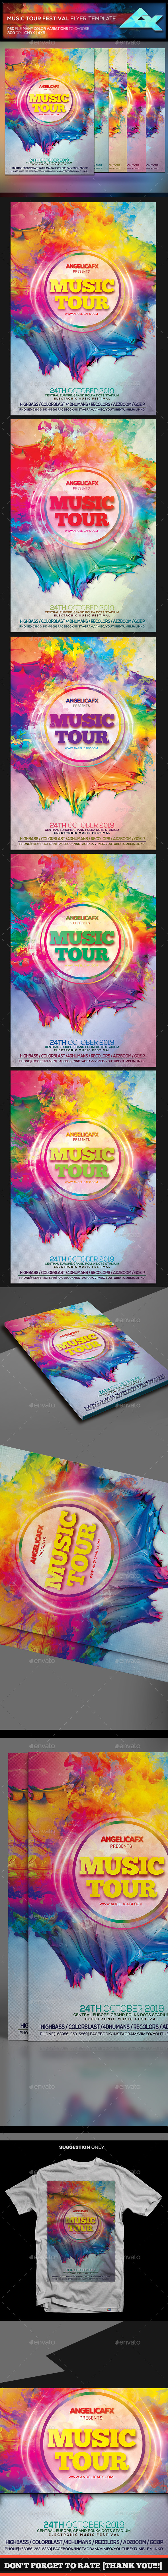 Music Tour Festival Flyer Template - Flyers Print Templates